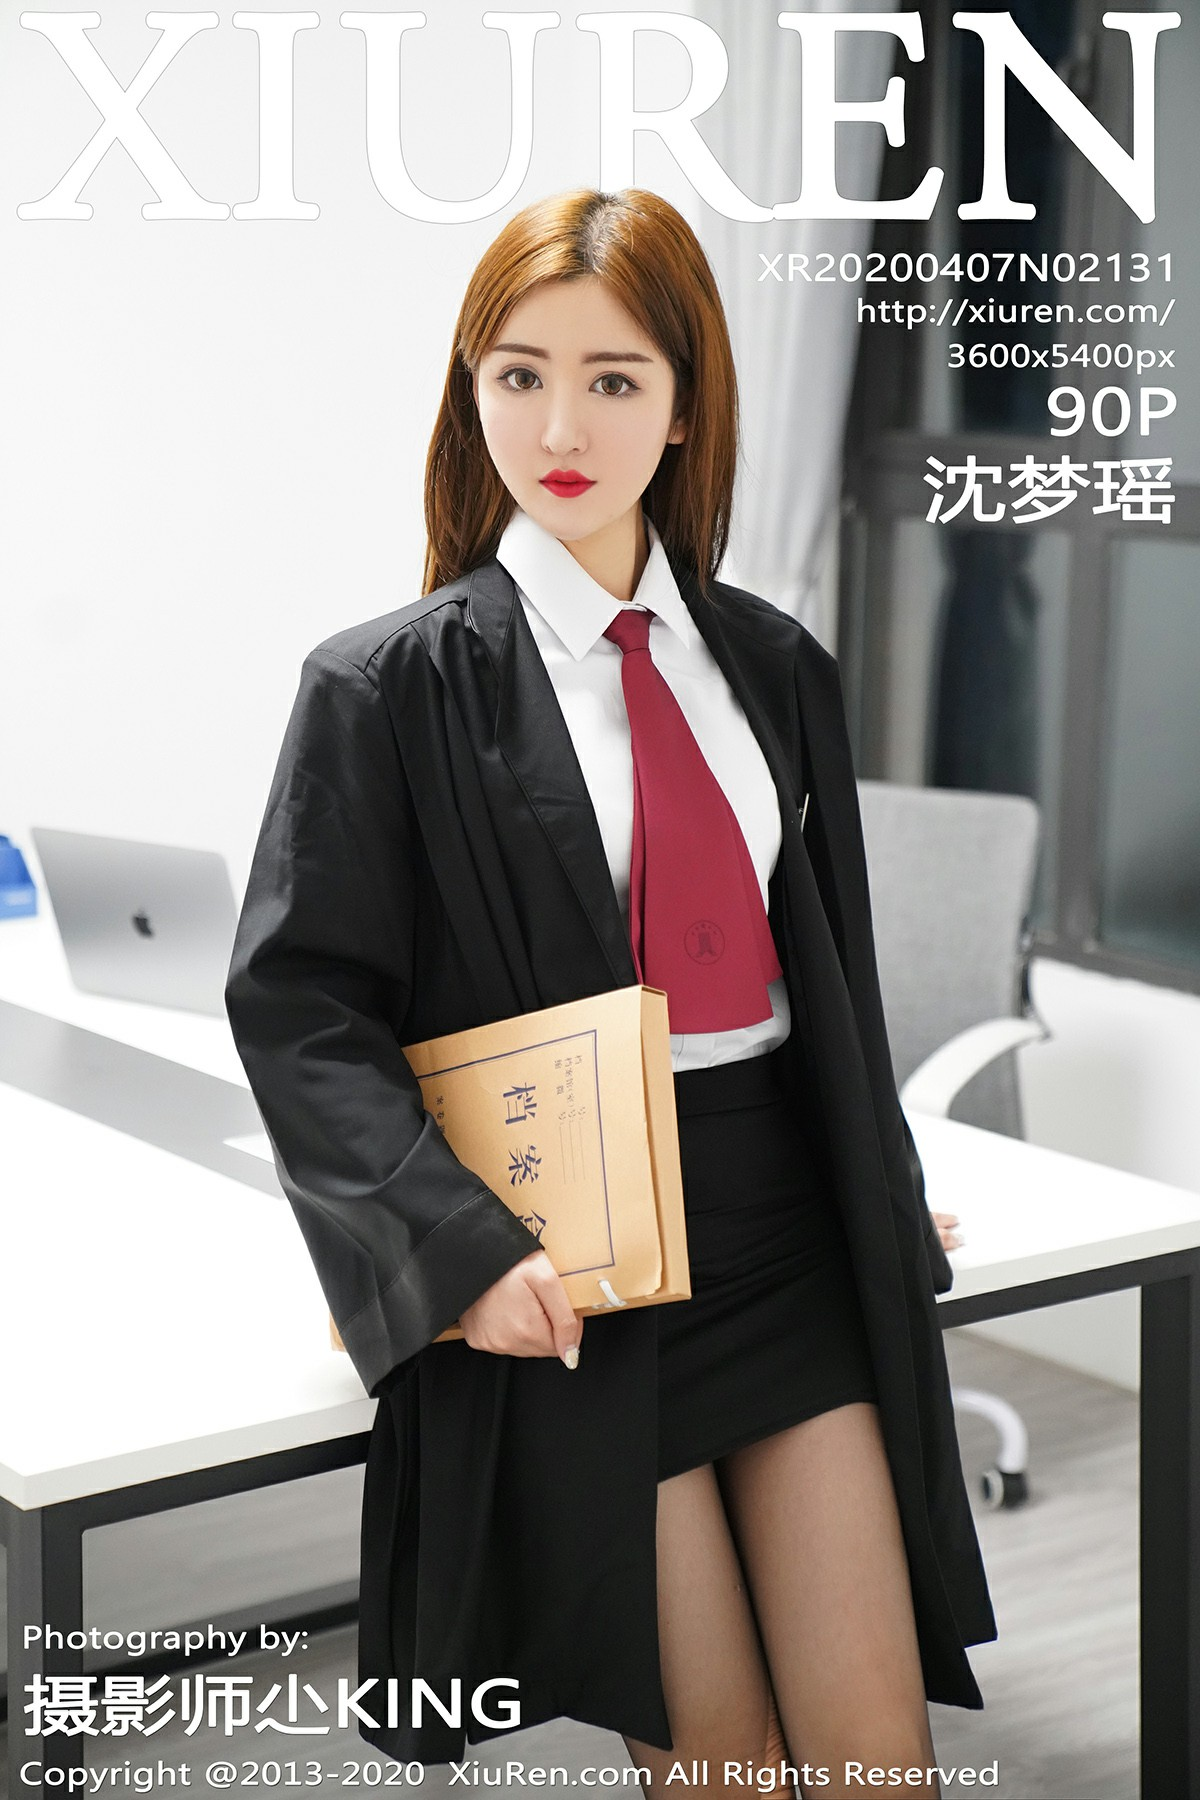 [XiuRen秀人网]2020.04.07 No.2131 沈梦瑶[91P] 秀人网 第1张